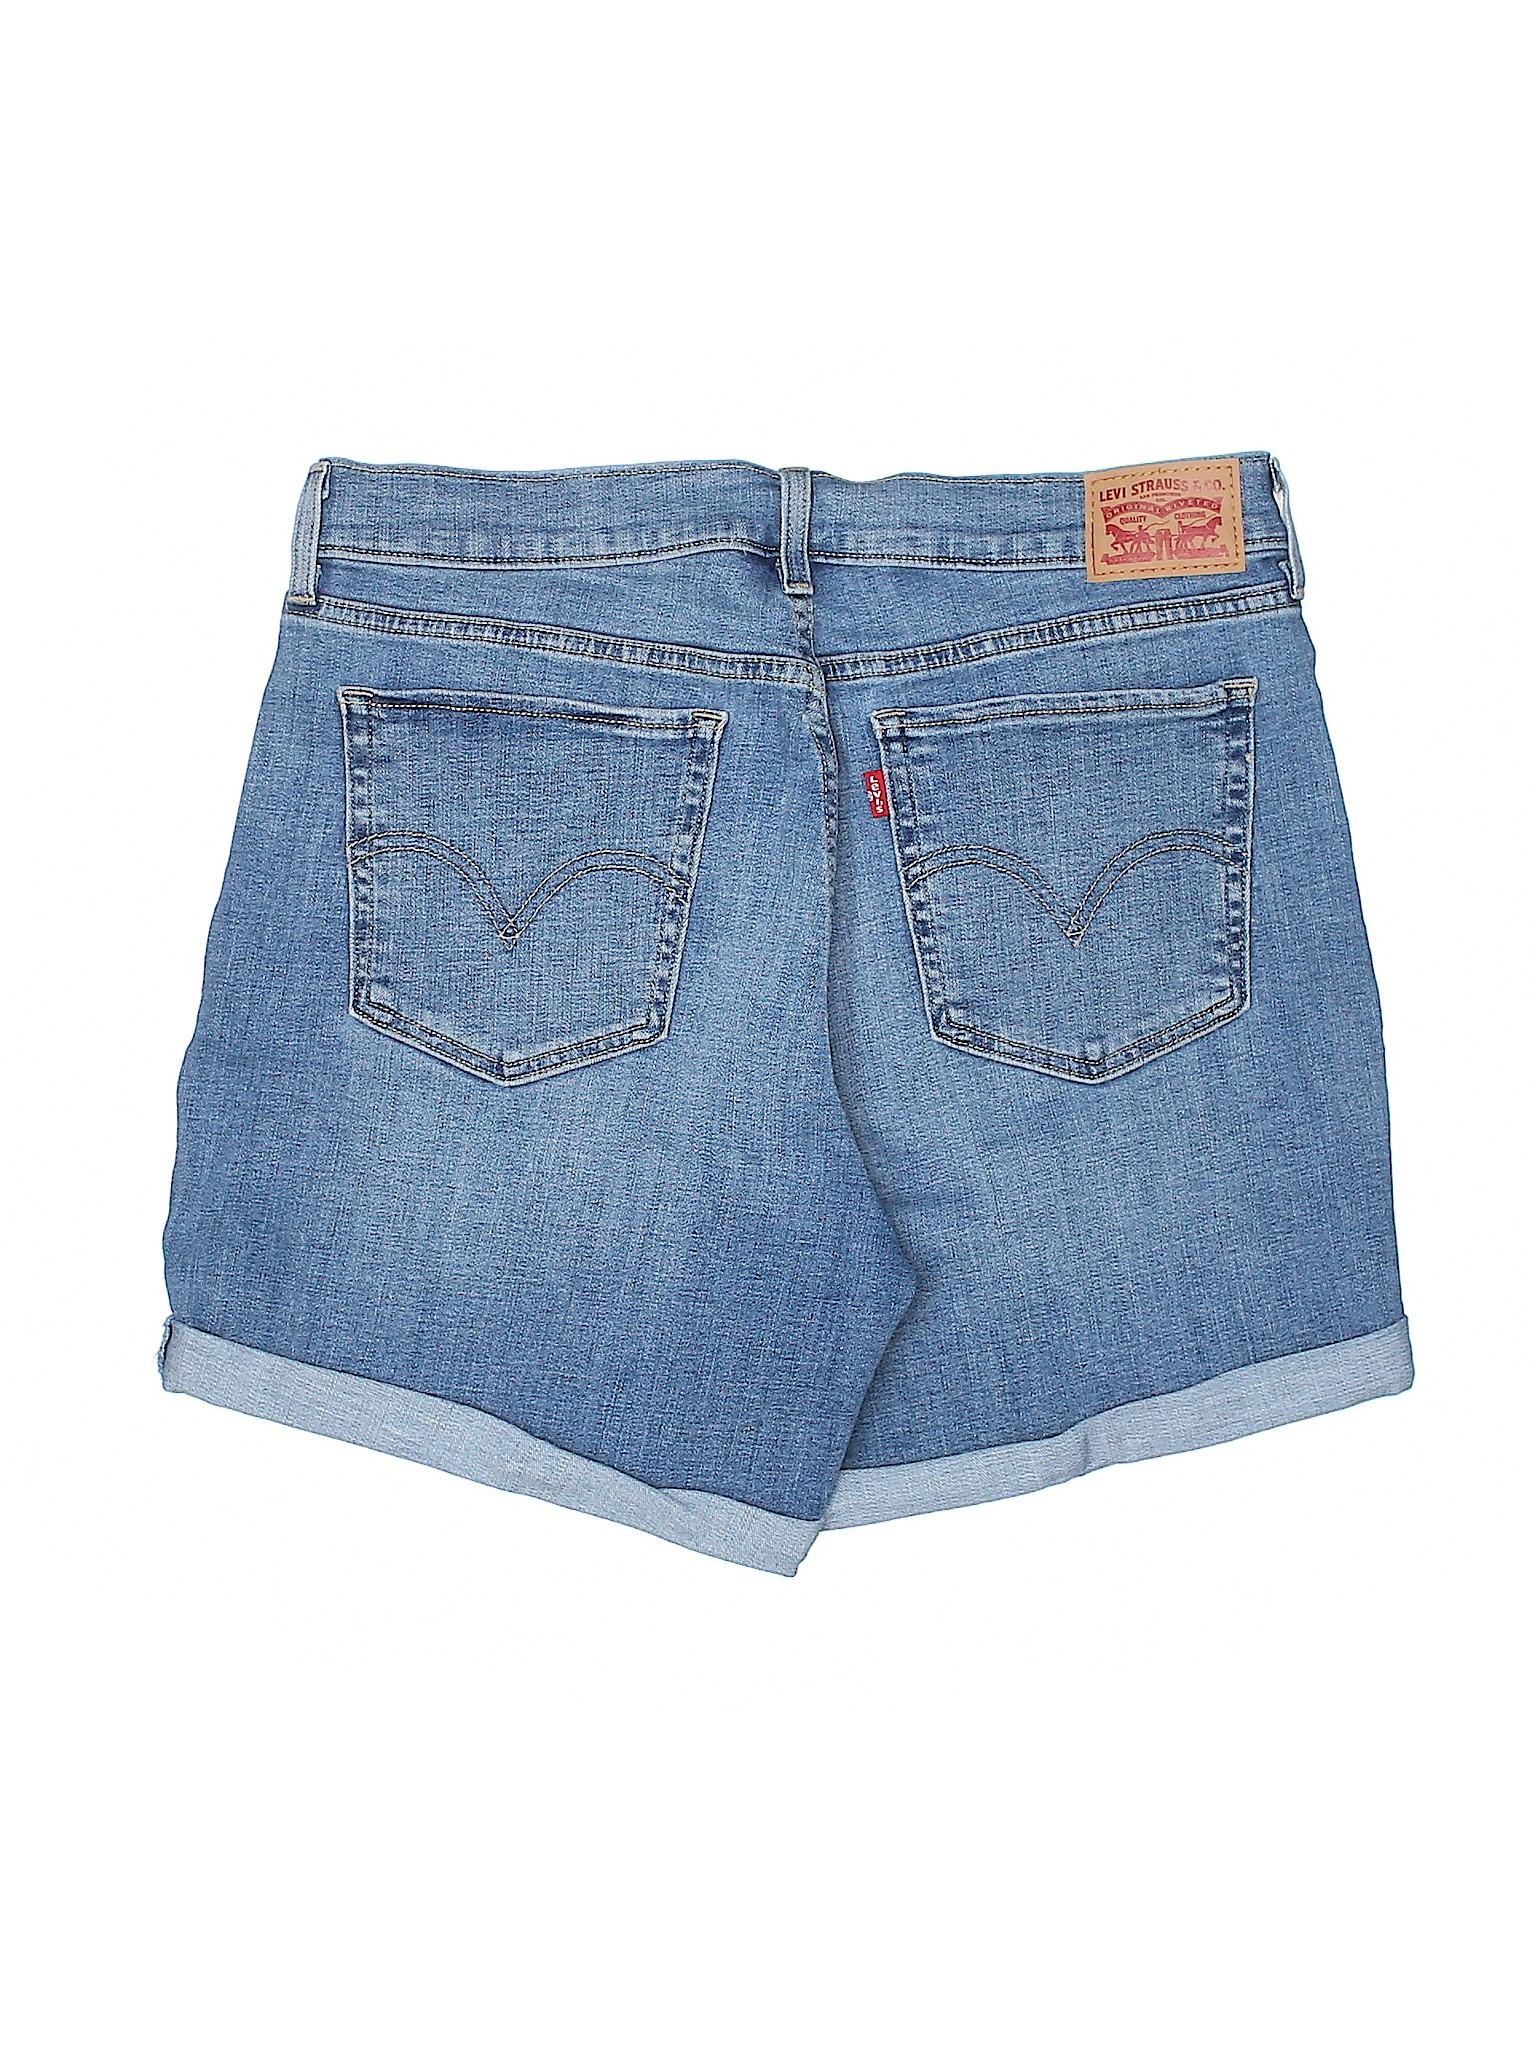 Shorts Levi's Levi's Boutique Boutique Boutique Denim Shorts Denim Levi's pBnwWva